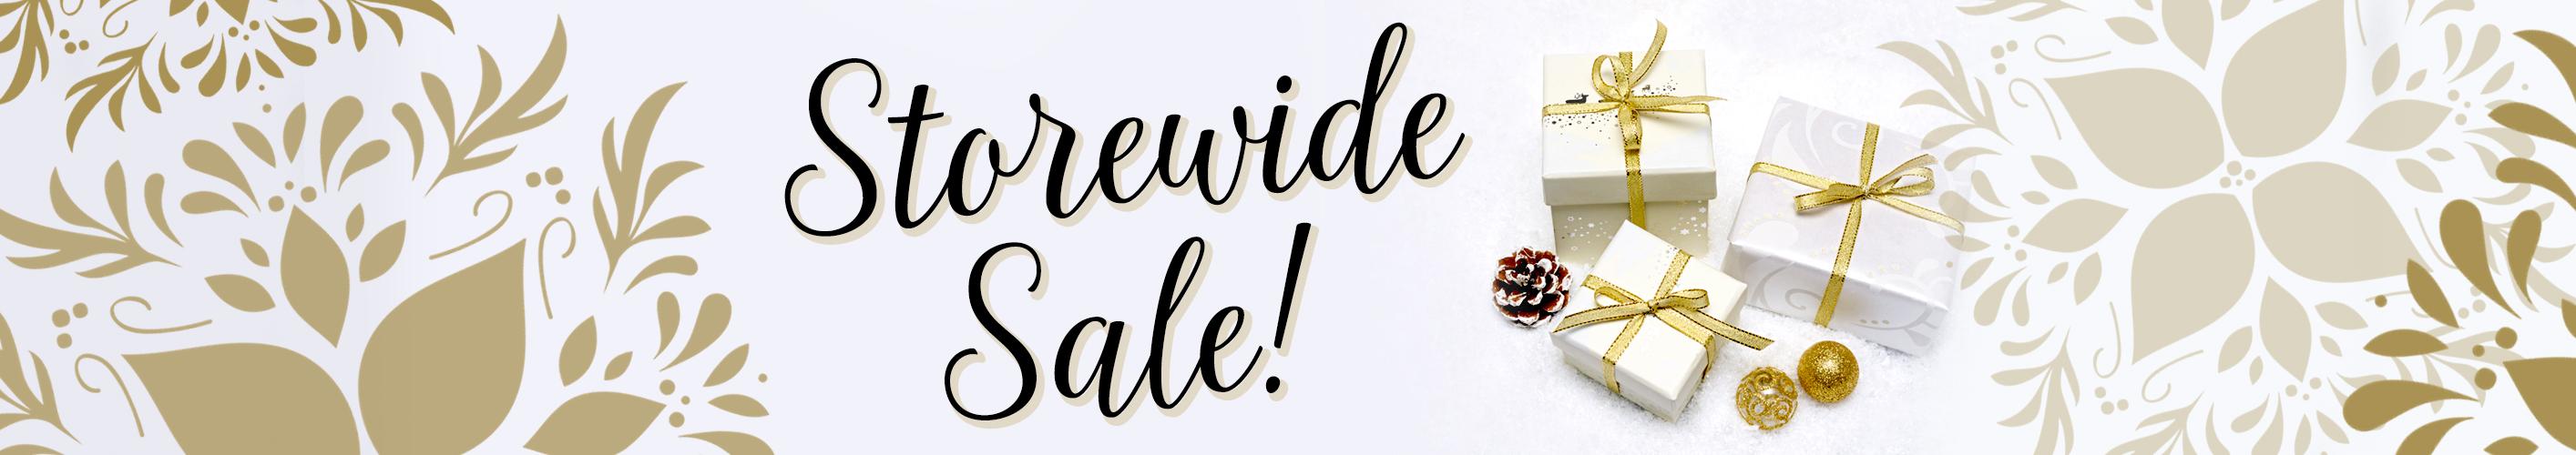 jemjewelers-warrington-christmas-jewelry-sale